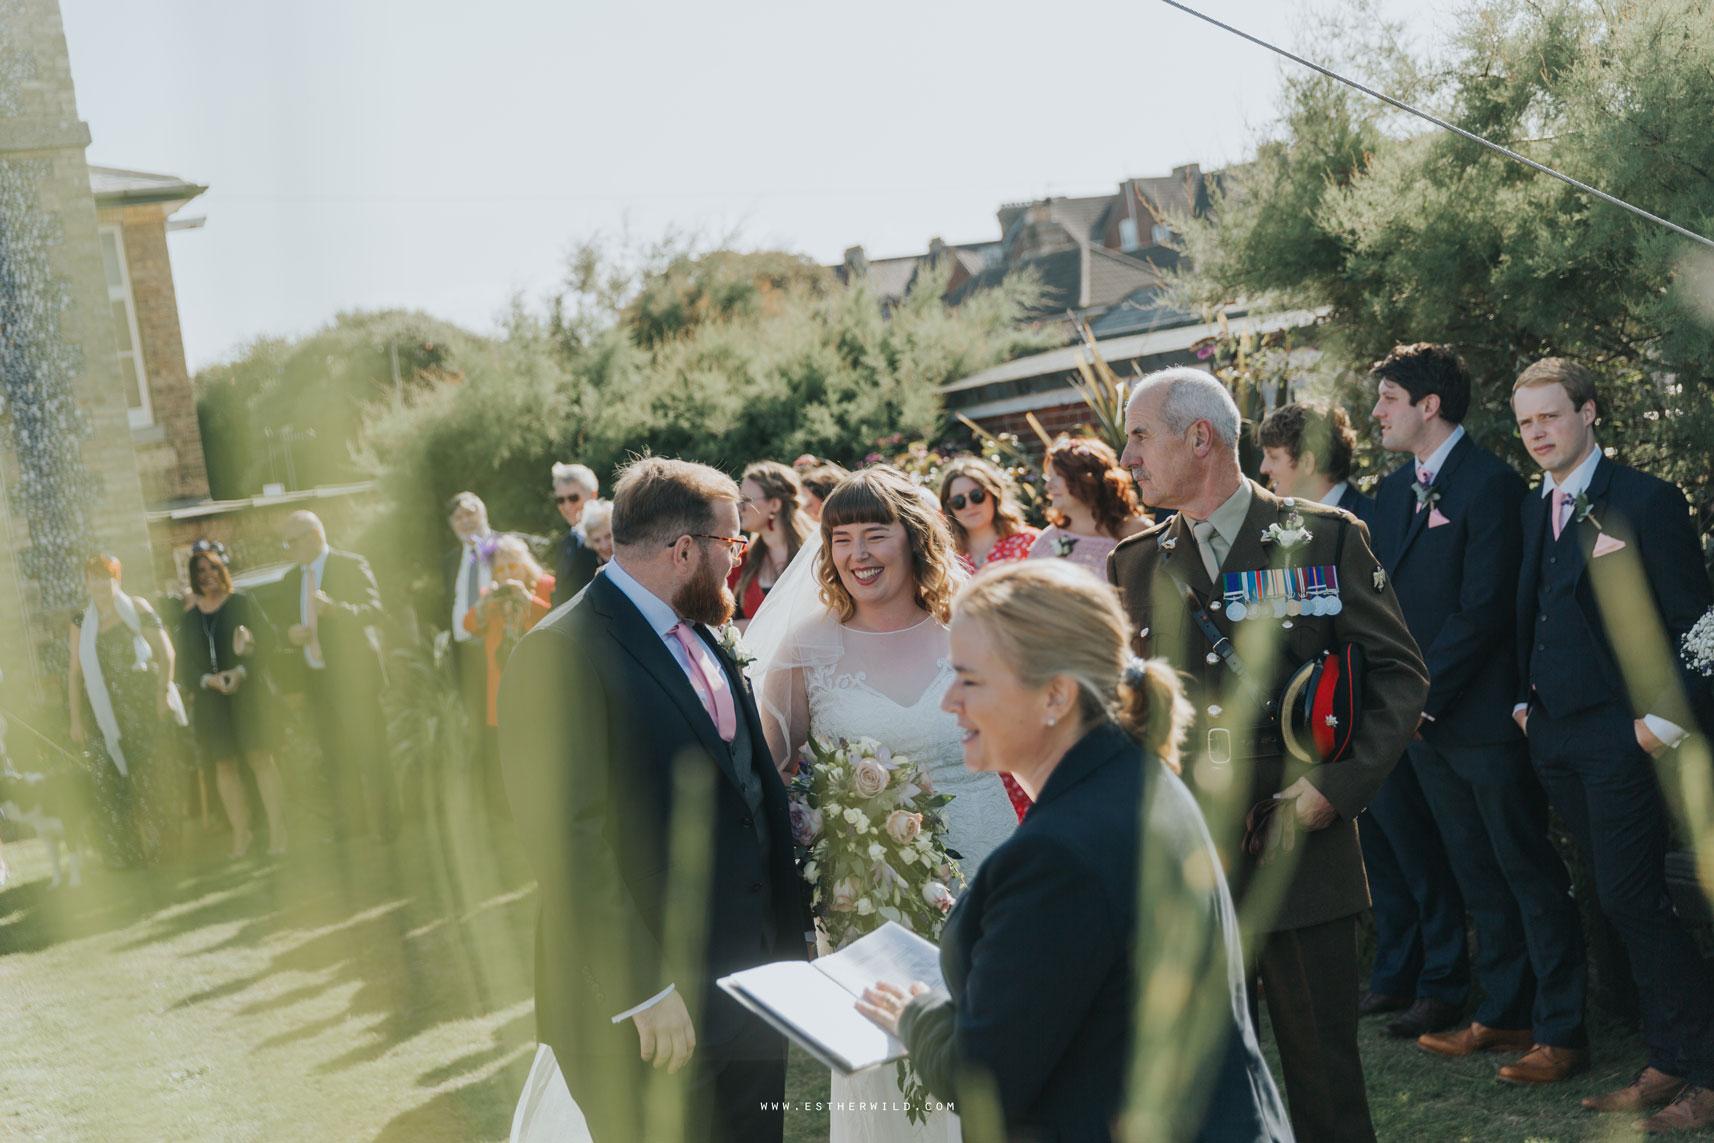 Cromer_Wedding_Beach_Outdoor_Ceremony_Norfolk_North_Lodge_Registry_Office_Rocket_House_Cafe_Cromer_Pier_IMG_3712_IMGL7914.jpg